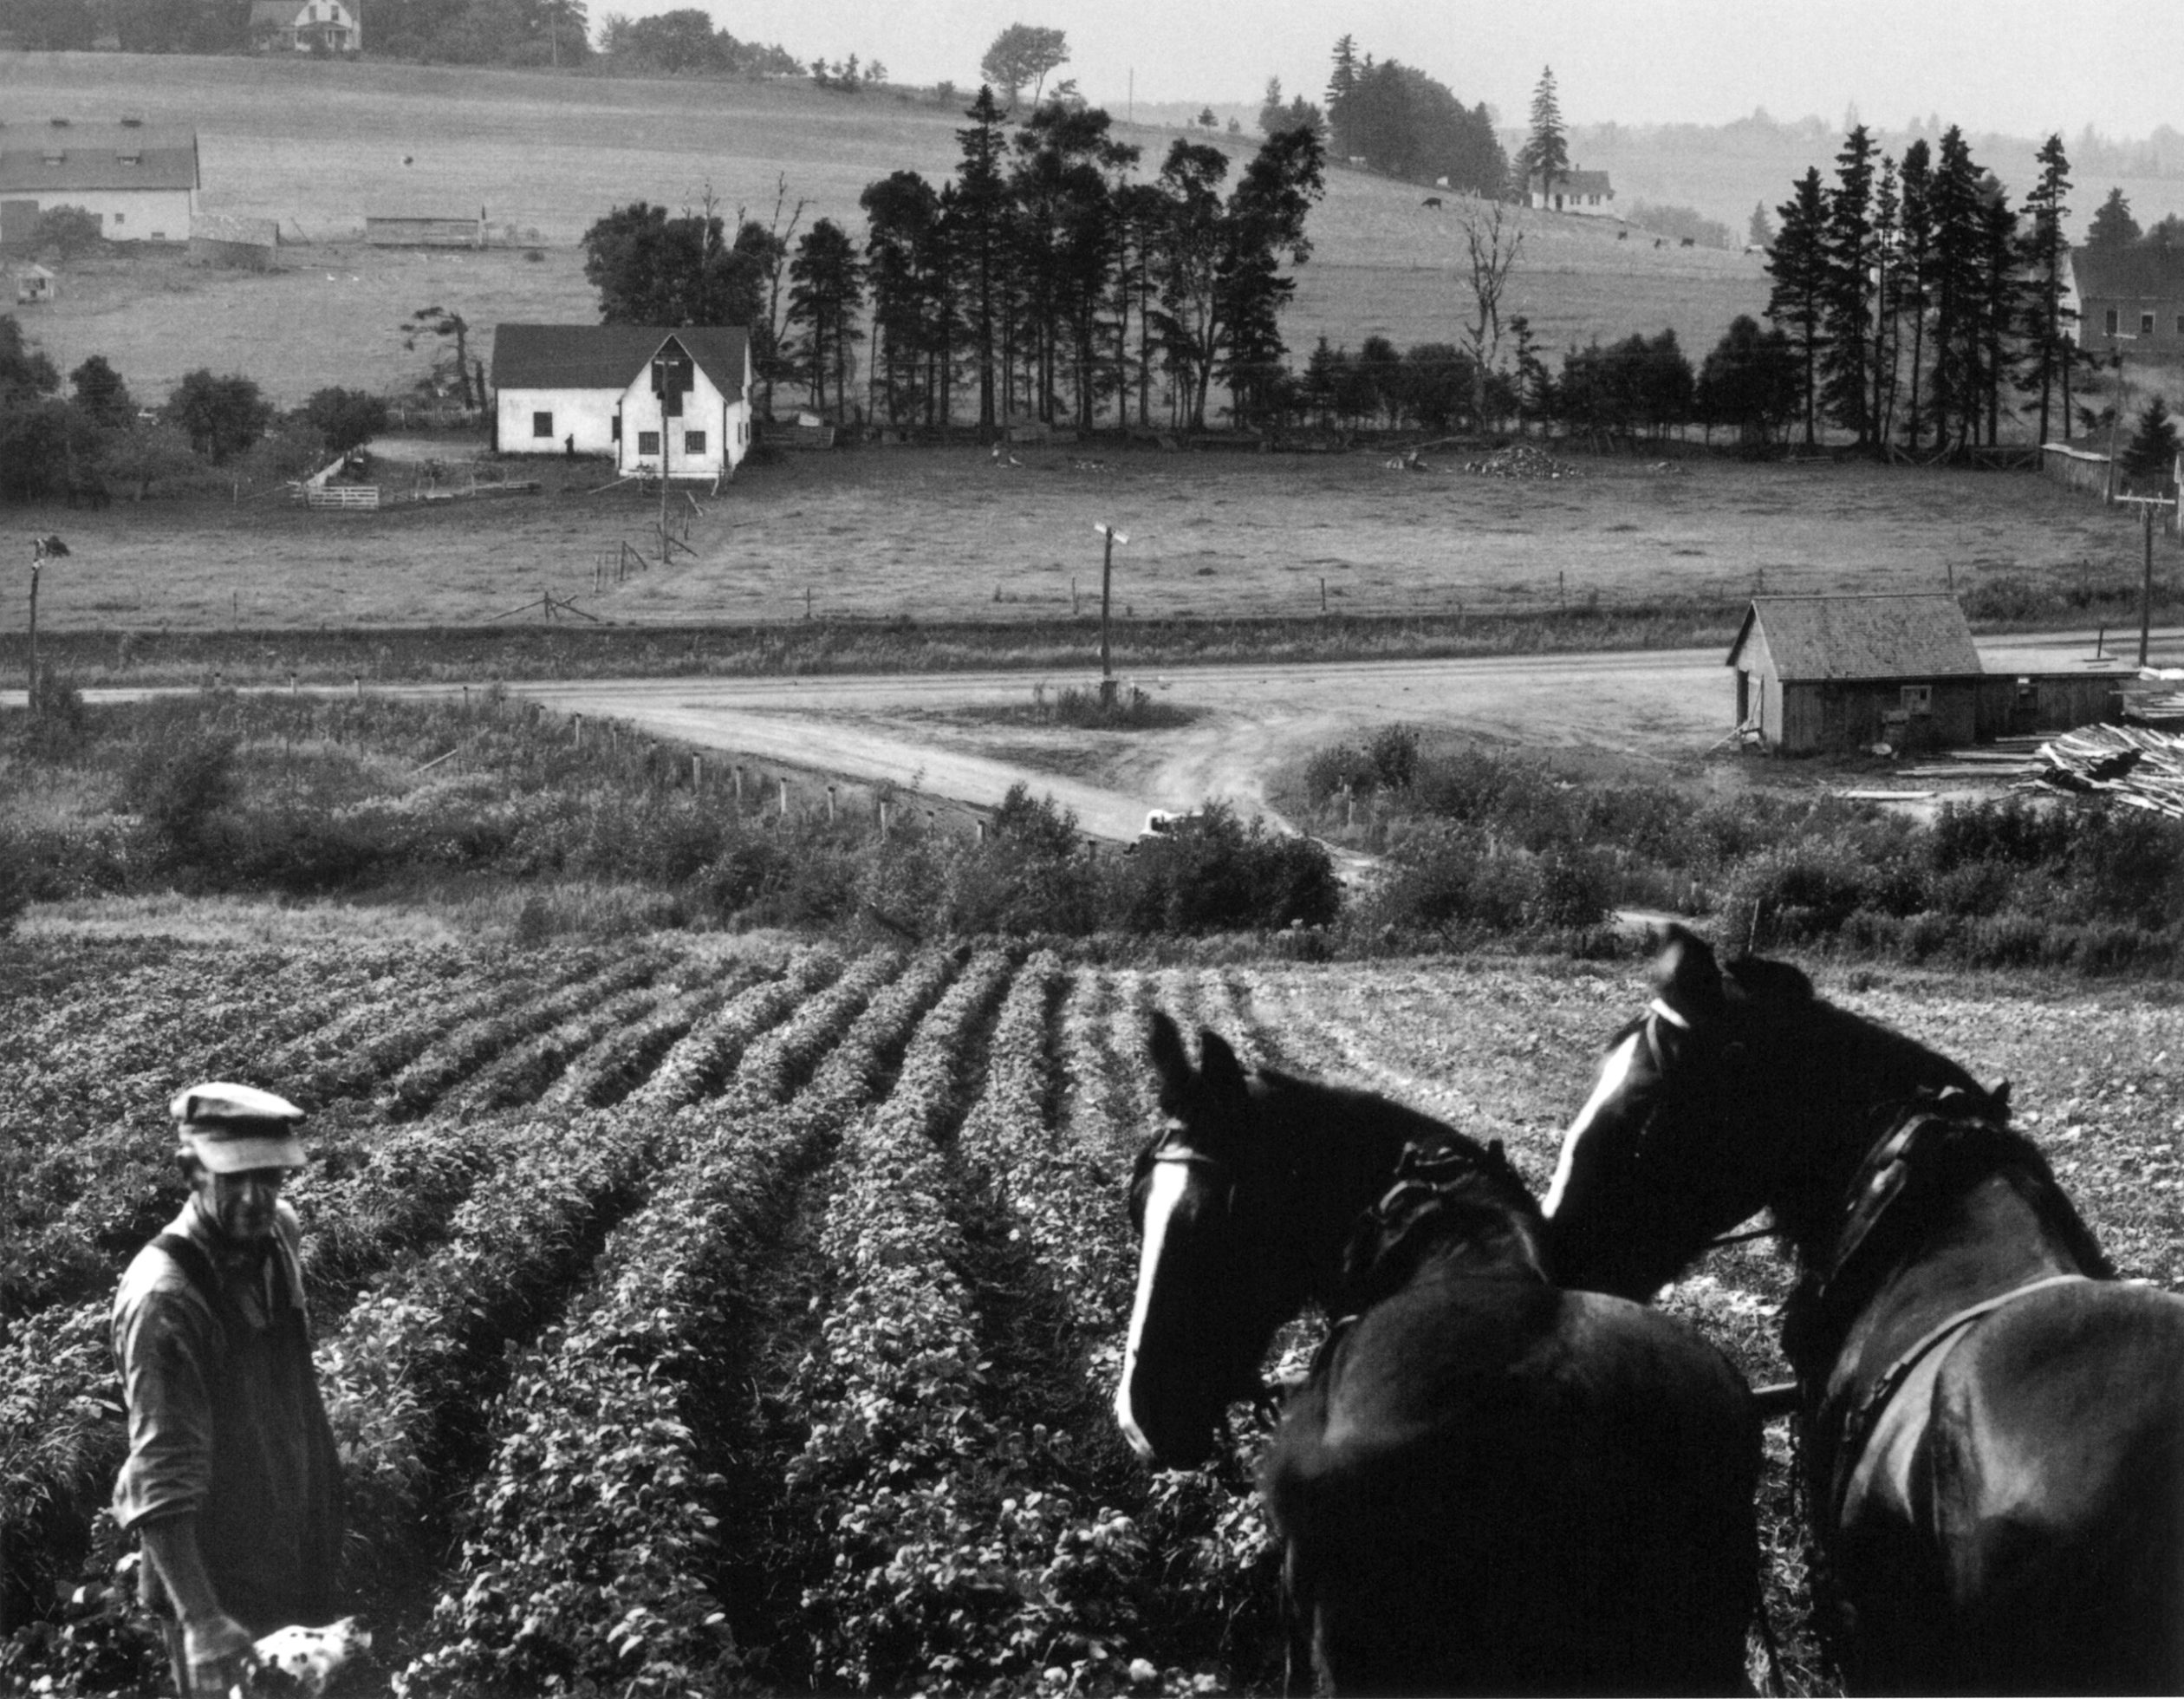 Horses and Farmer